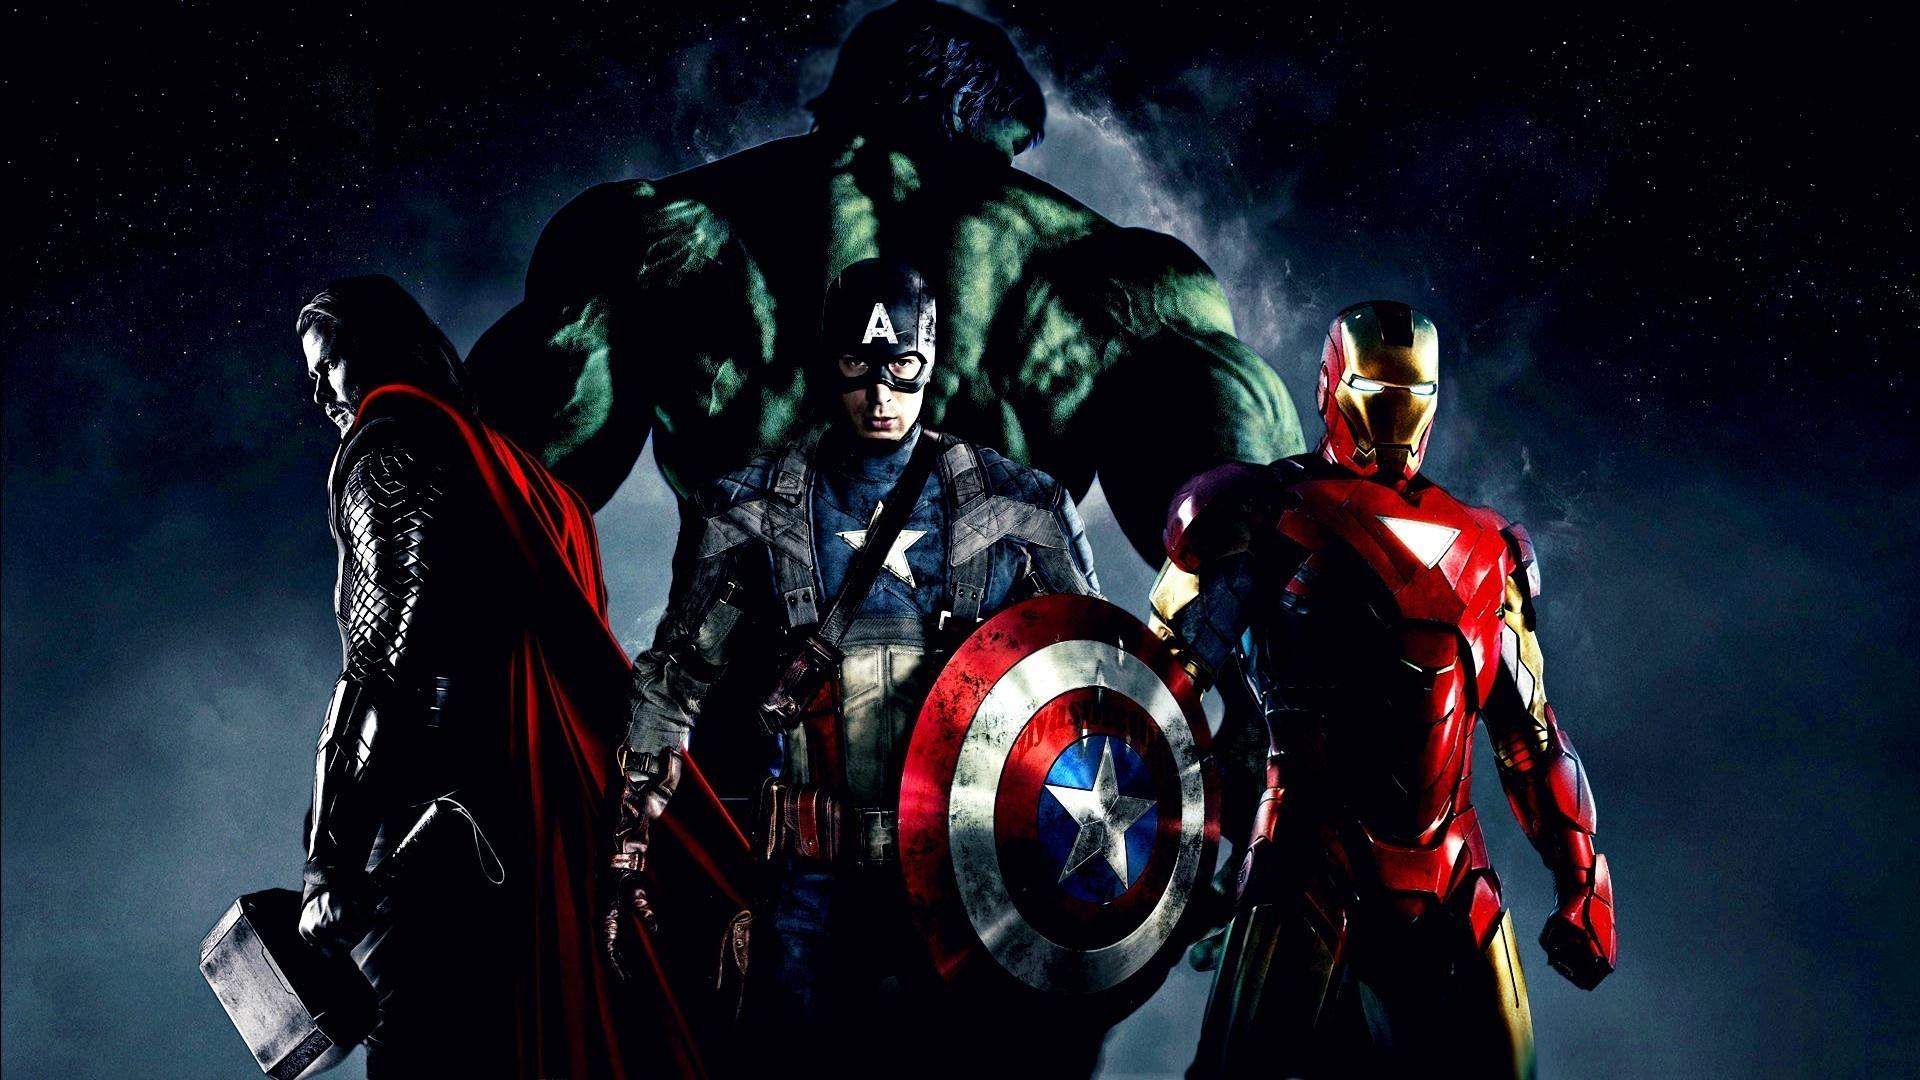 The Avengers 2012 movie Wallpaper 1920x1080 resolution wallpaper 1920x1080